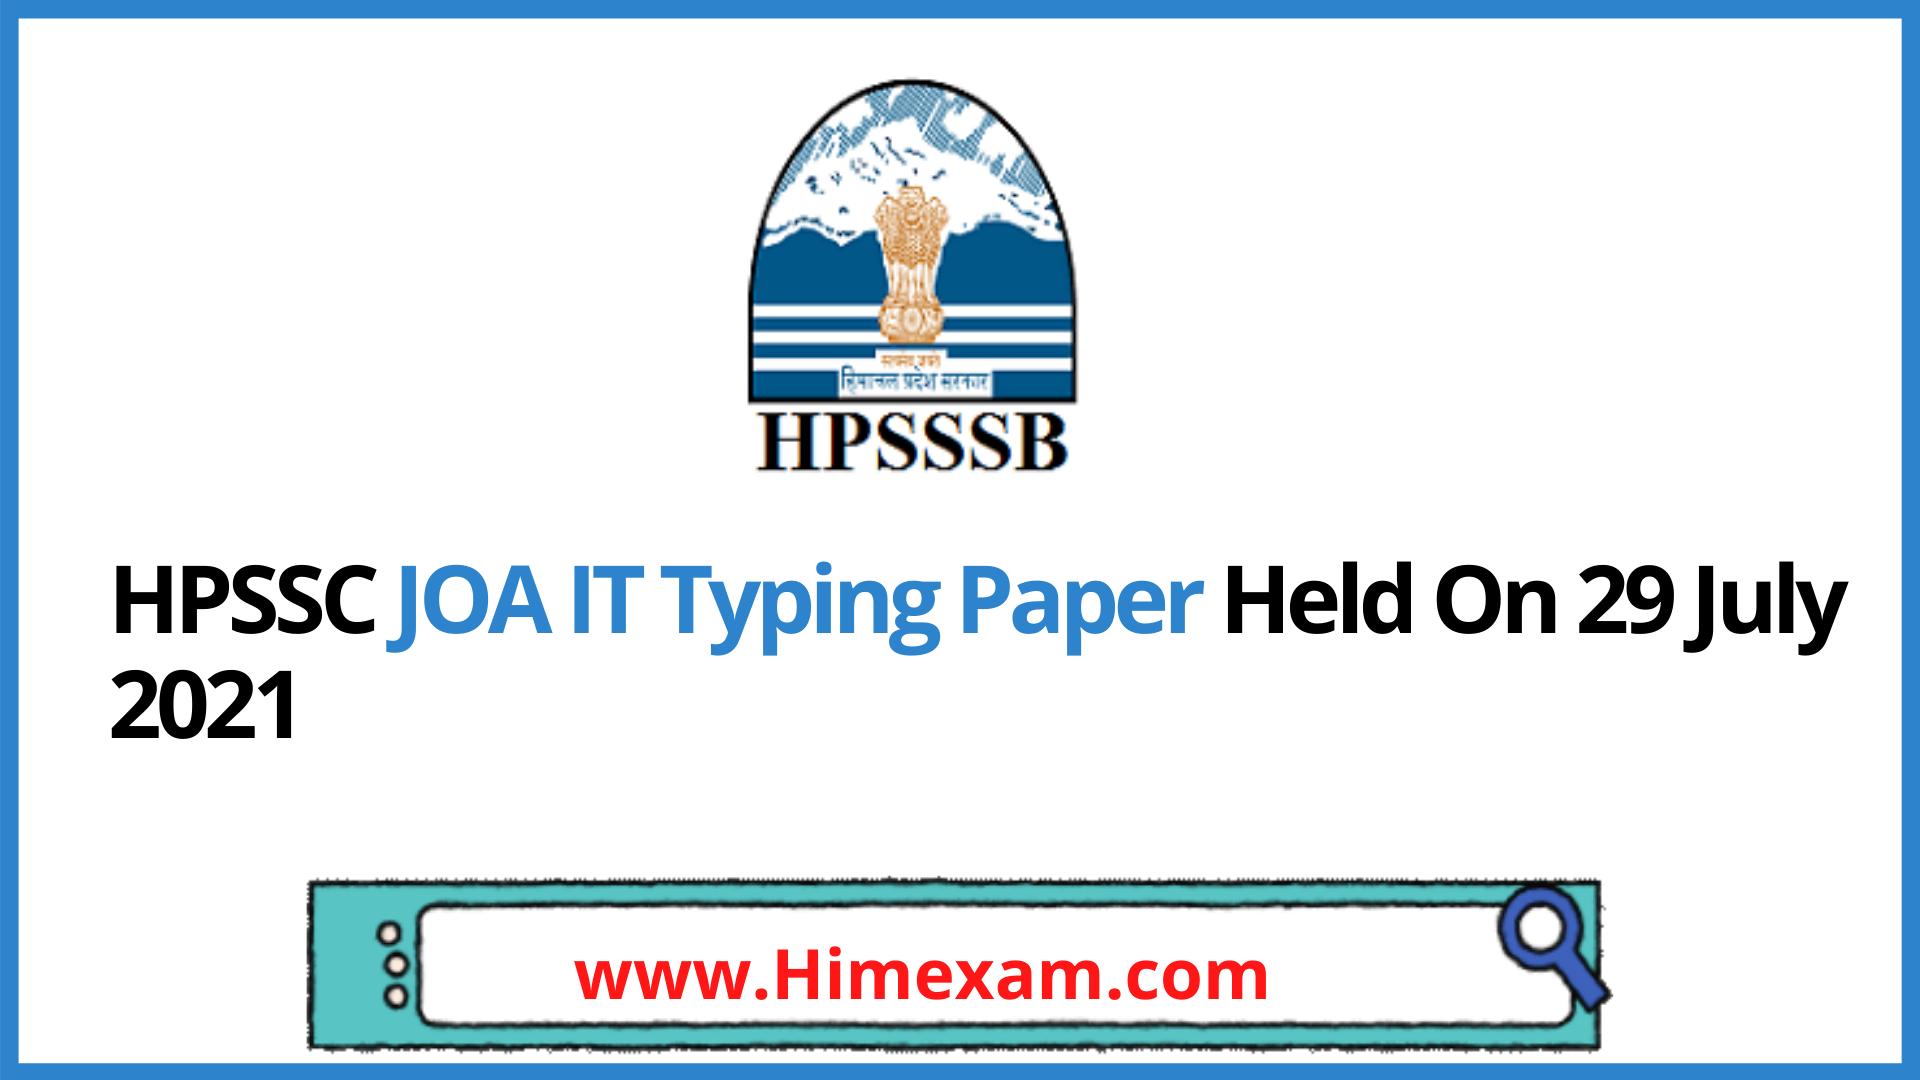 HPSSC JOA IT Typing Paper Held On 29 July 2021